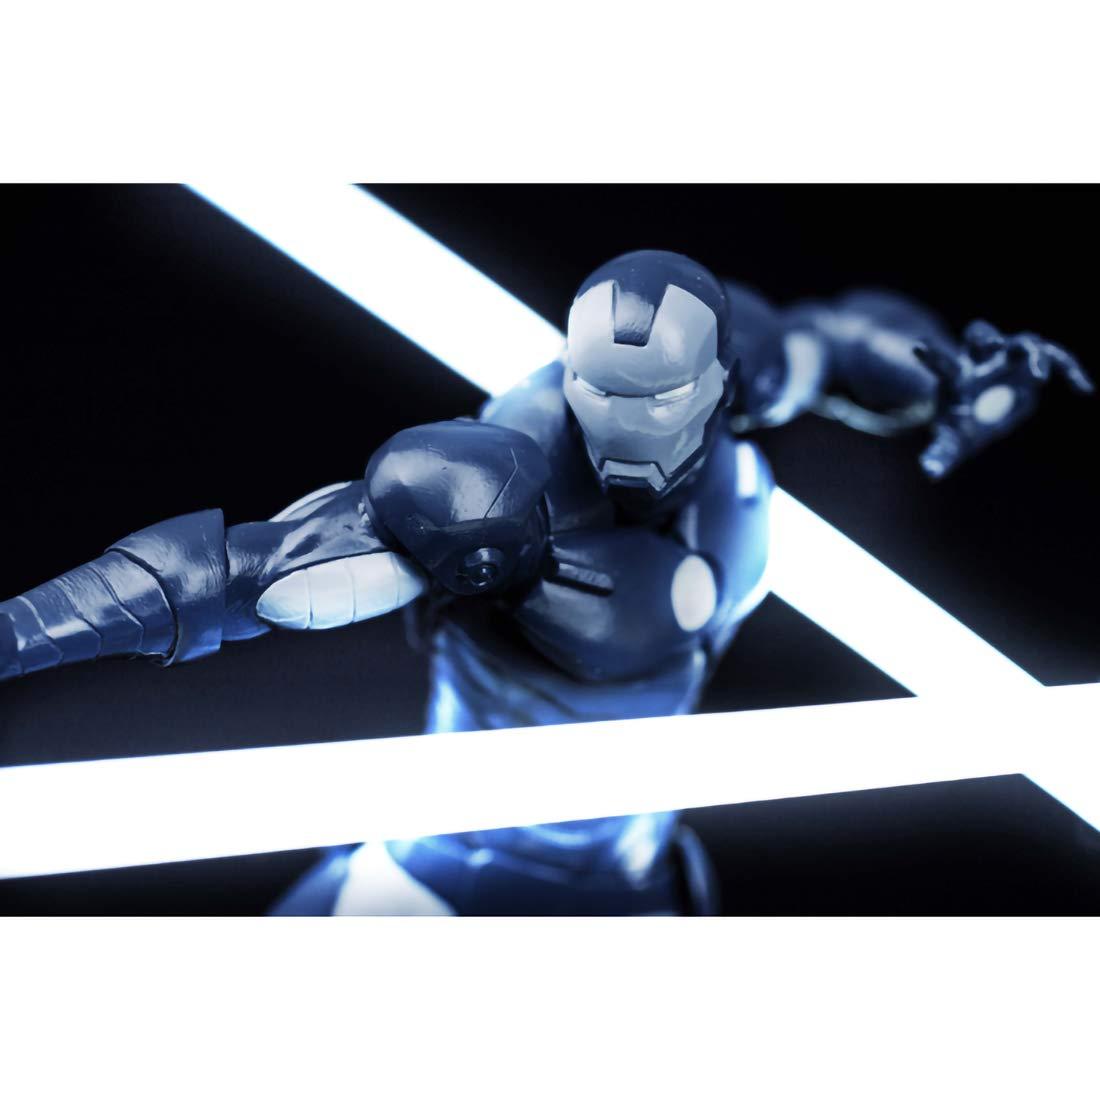 1 Official Marvel Trading Card Bundle 38403 Banpresto Iron Man Monotone : ~6.3 Iron Man x Marvel Creator x Creator Statue Figurine BCC9419440